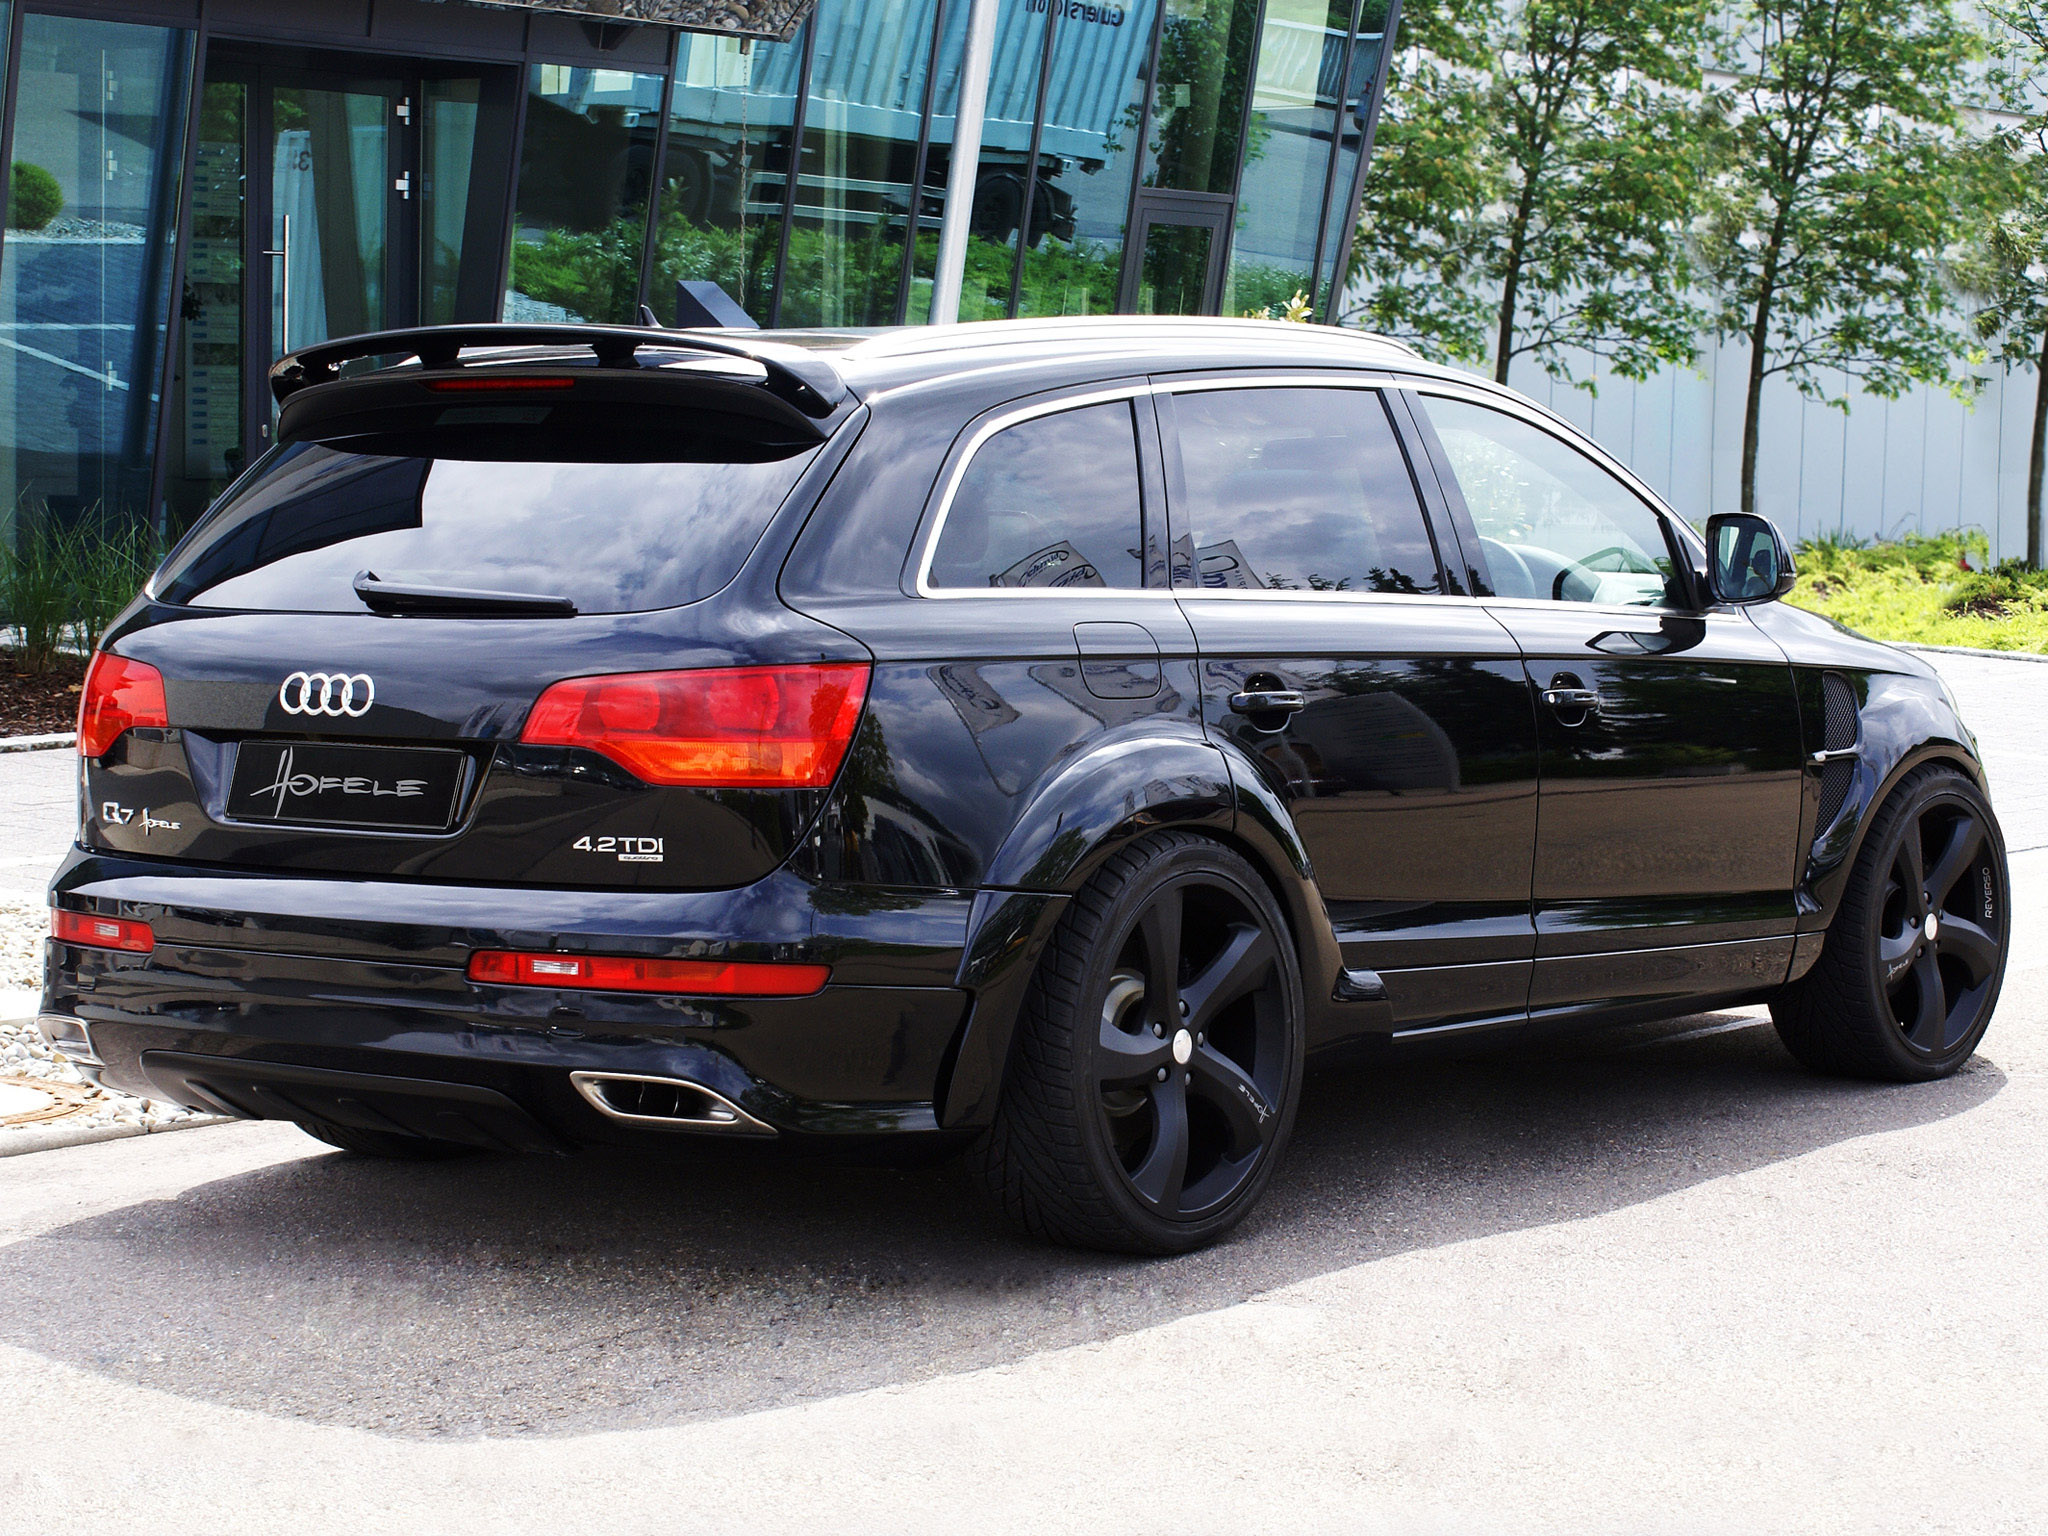 Kelebihan Kekurangan Audi Q7 2008 Review